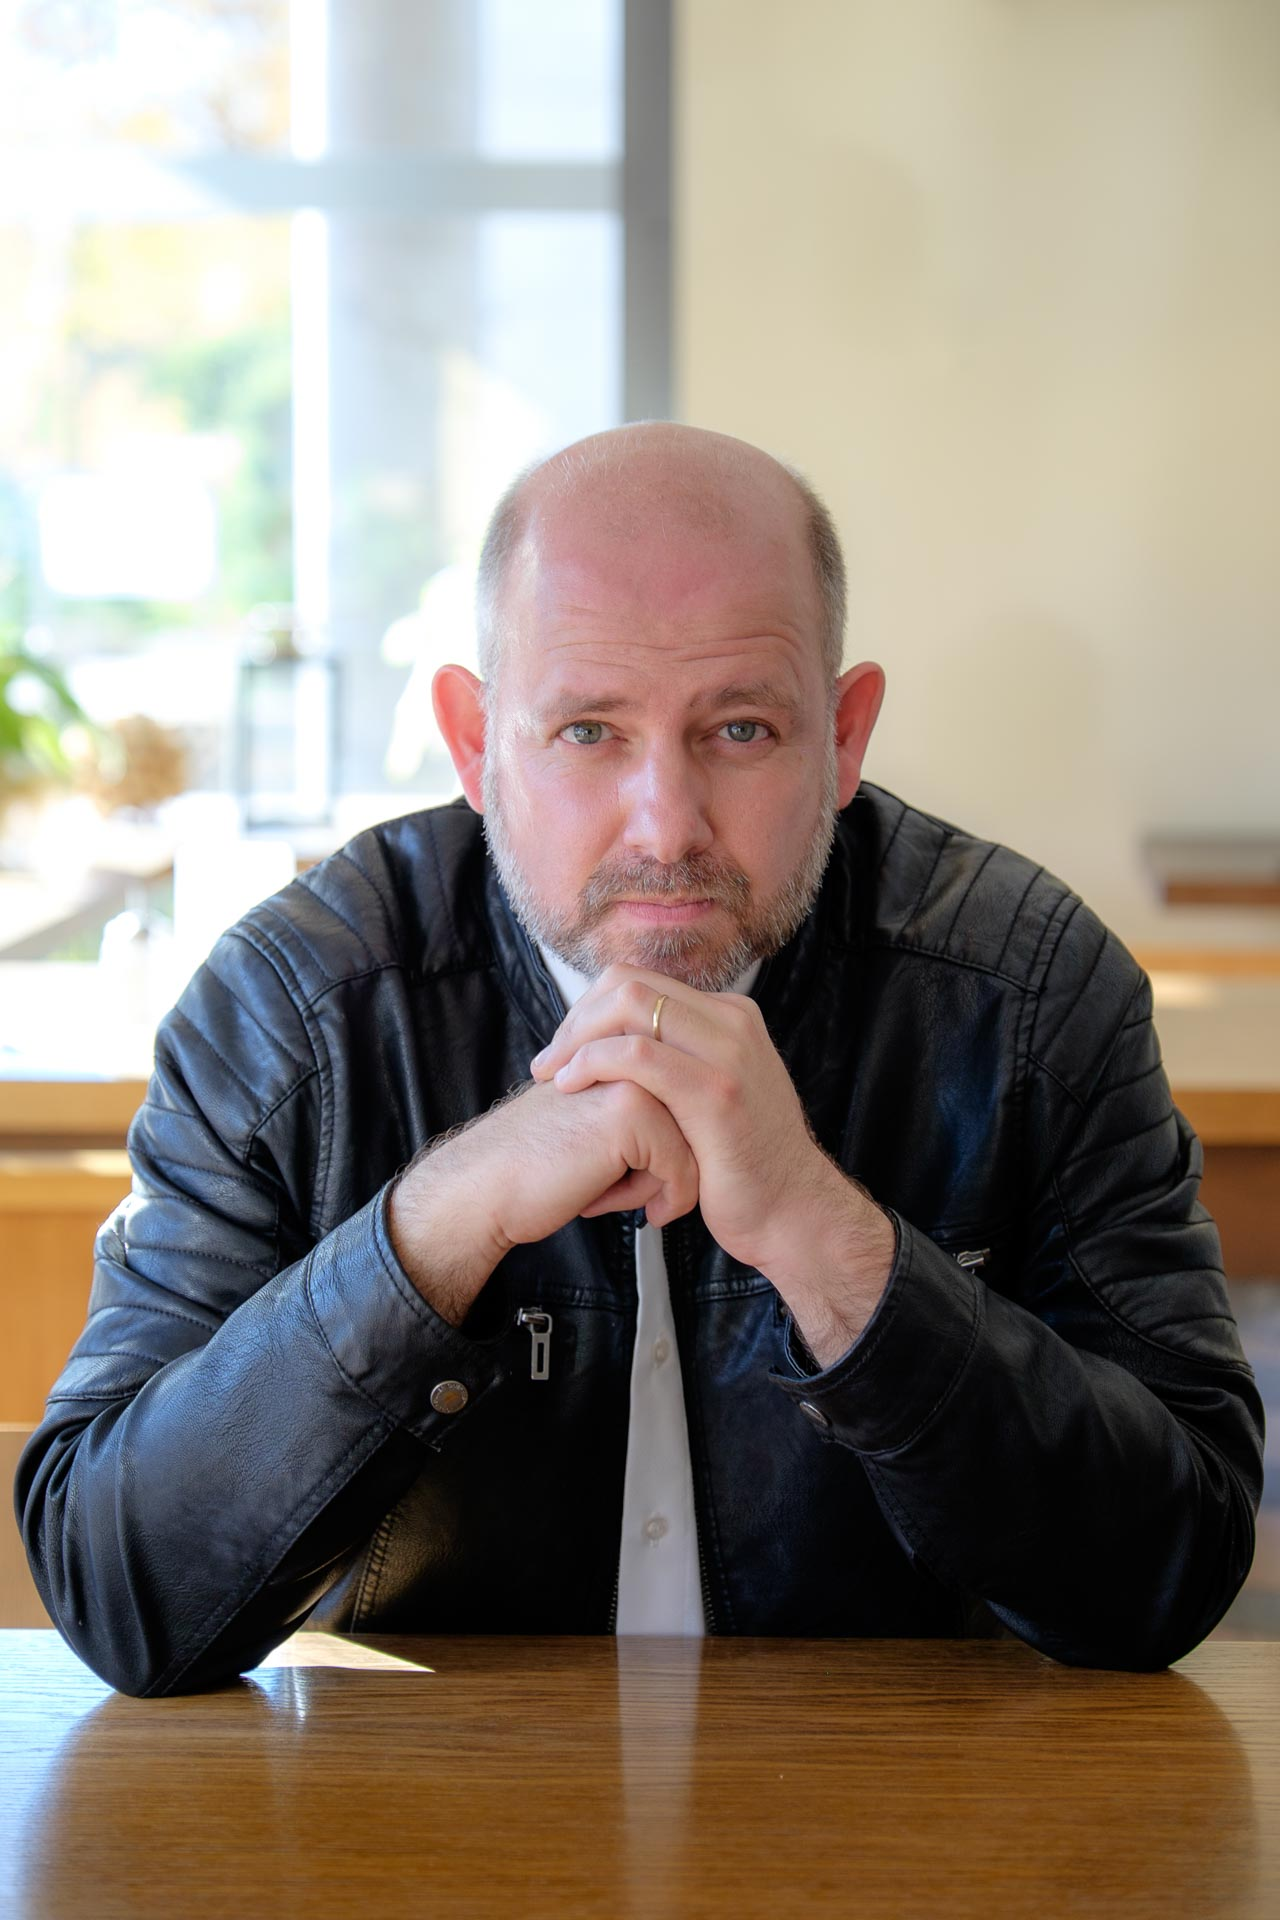 Liebglück Fotograf Schauspieler Holger Ries Bad Rappenau